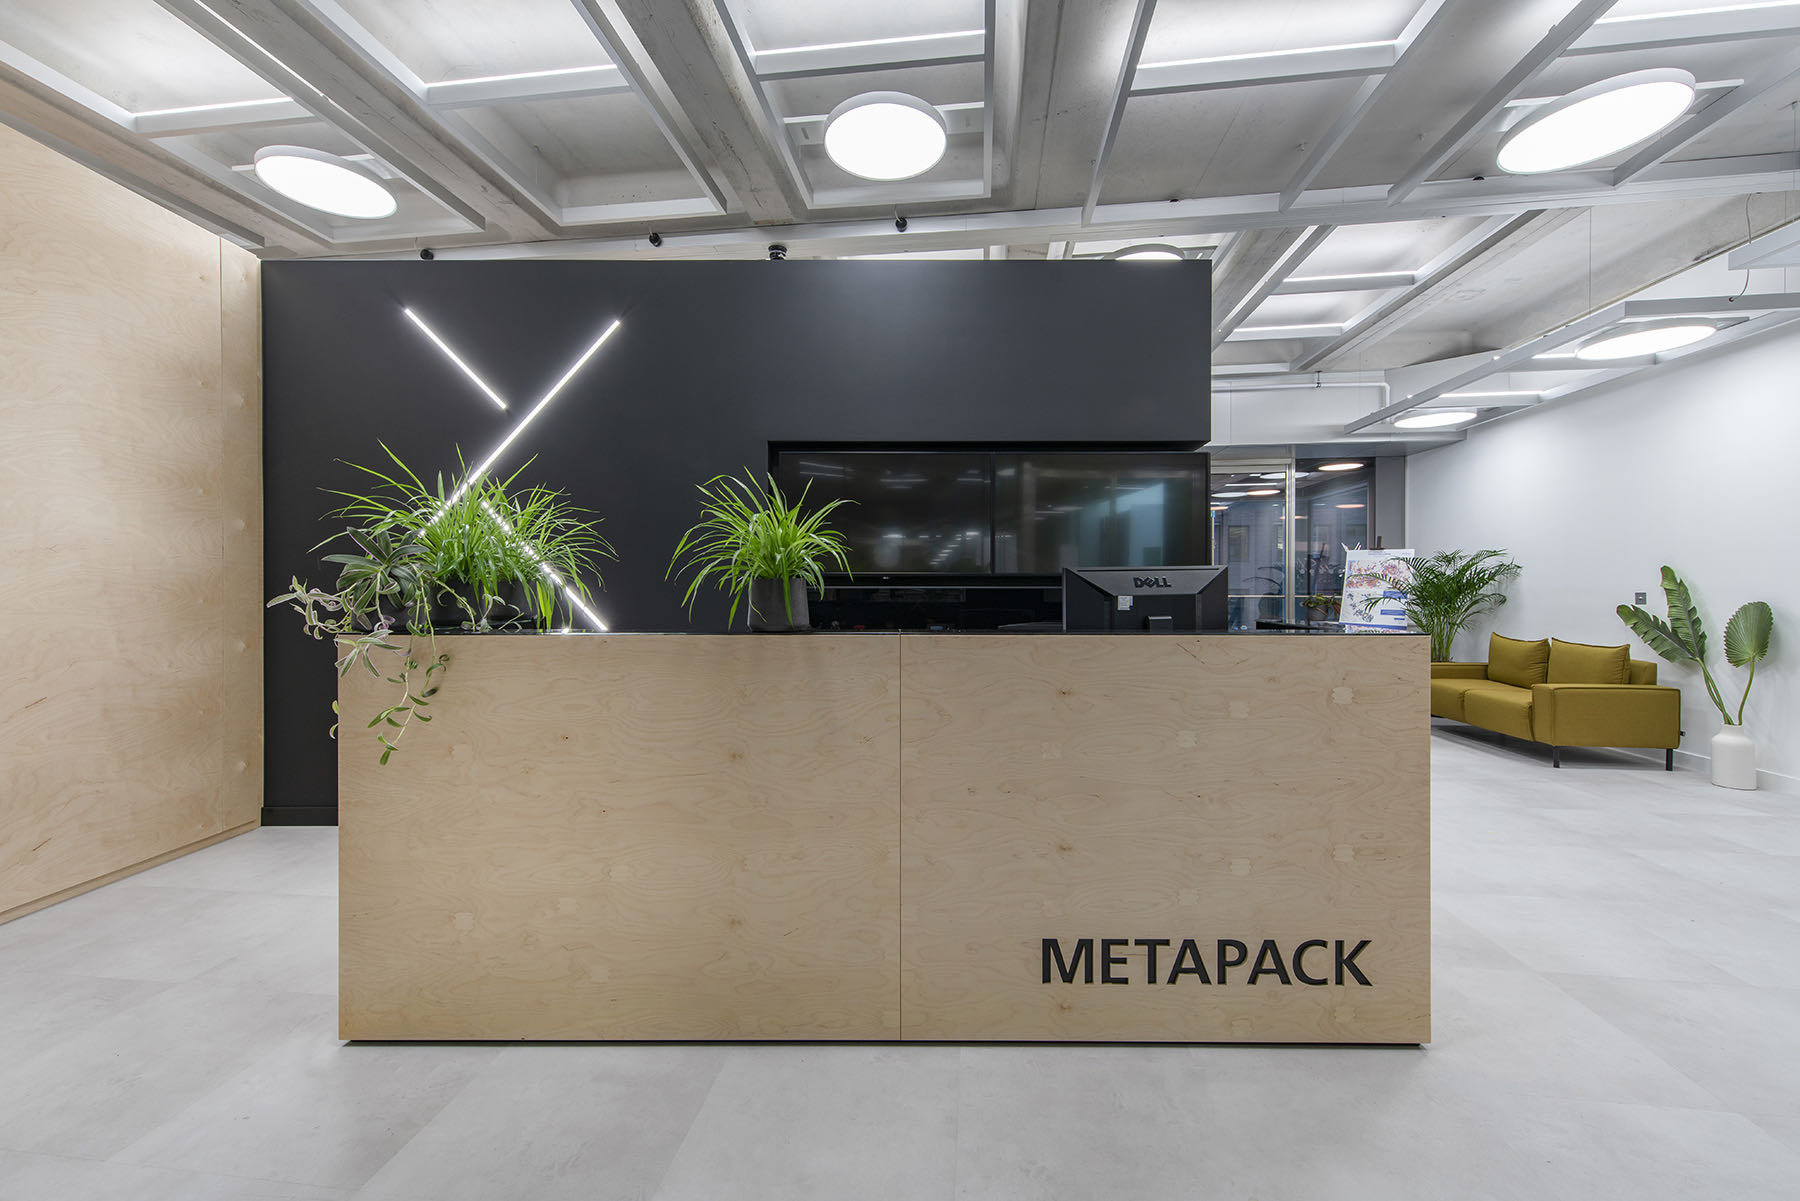 metapack-london-office-2